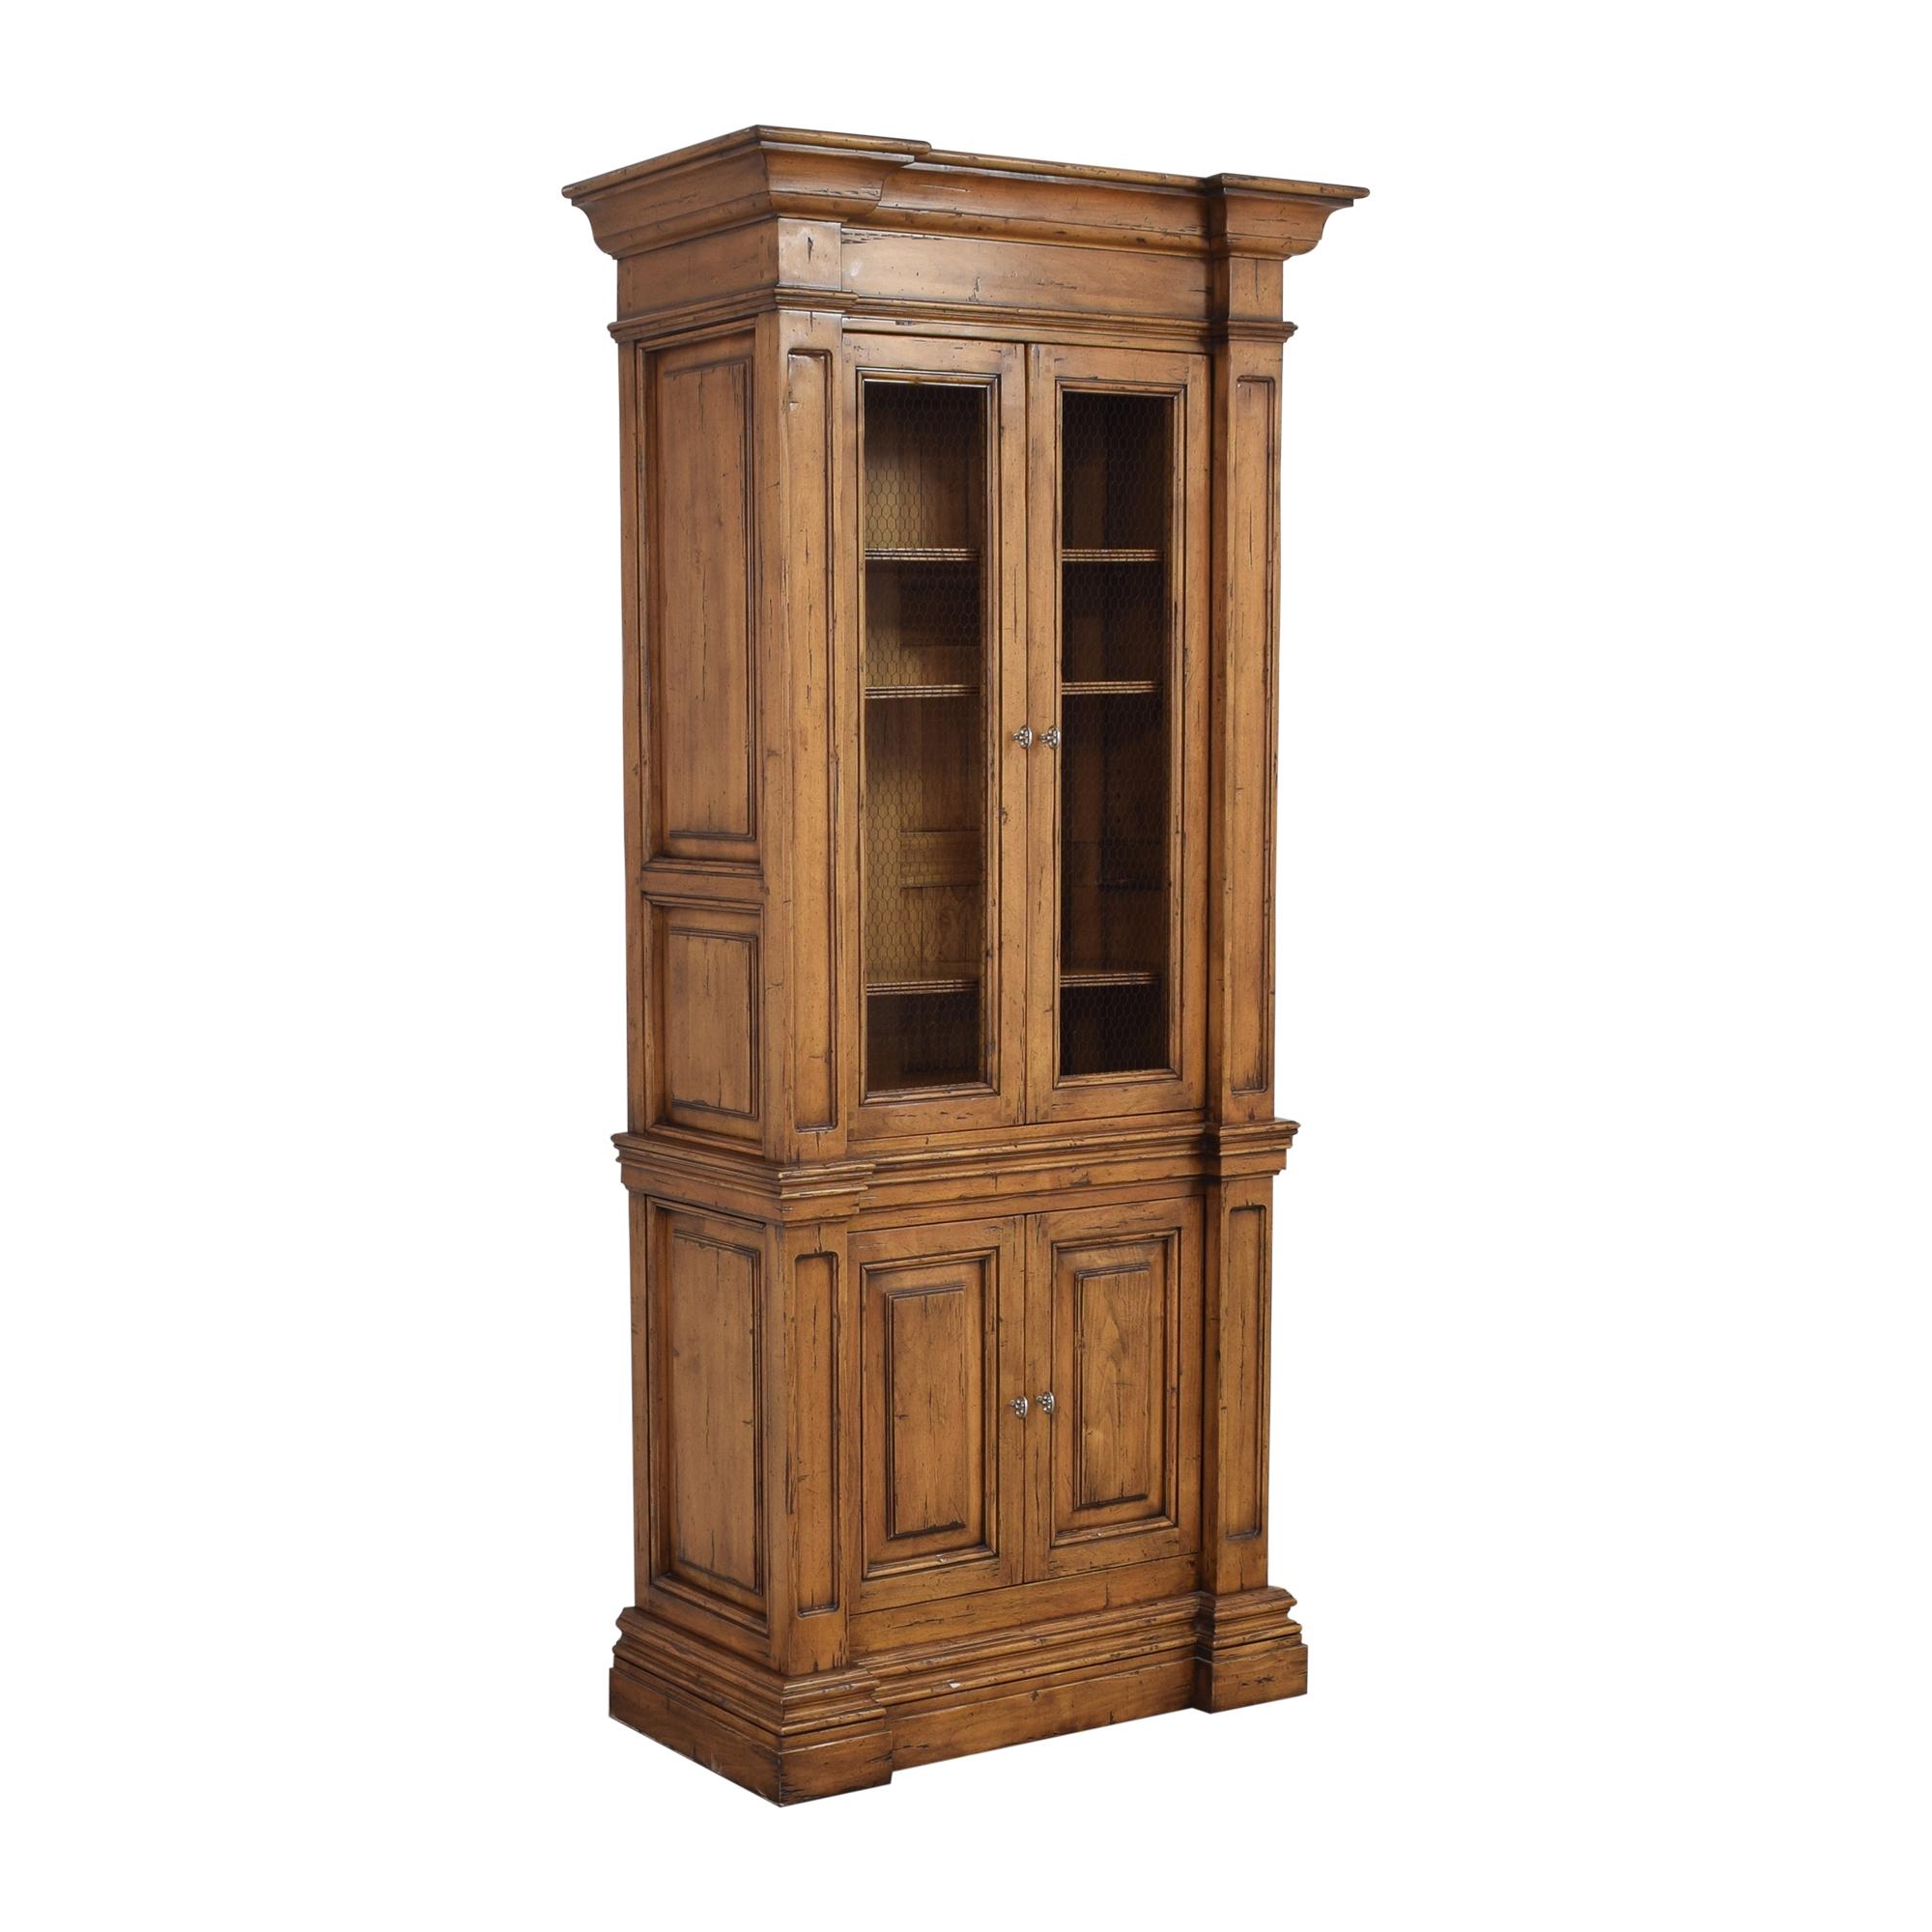 buy Guy Chaddock & Co. Hutch Cabinet Guy Chaddock & Co. Storage